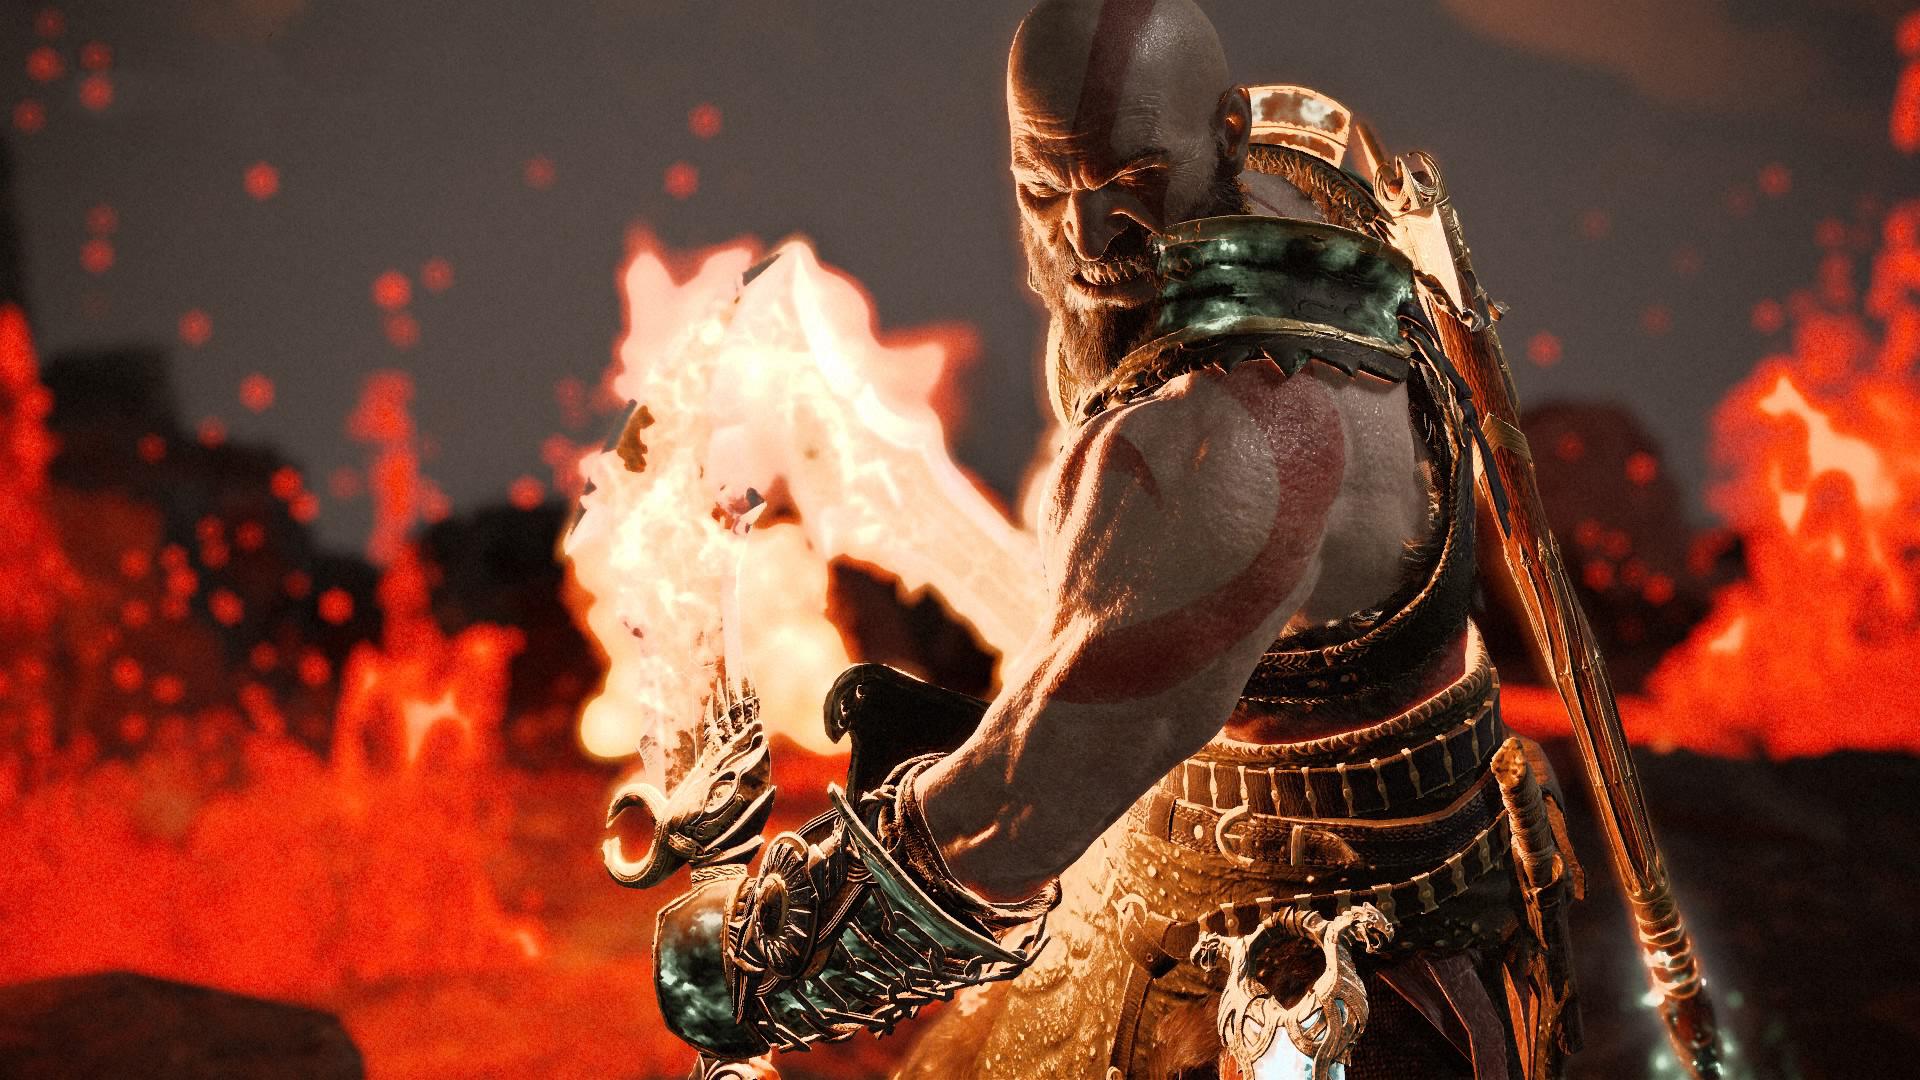 Kratos God Of War 4 Game Hd Games 4k Wallpapers Images